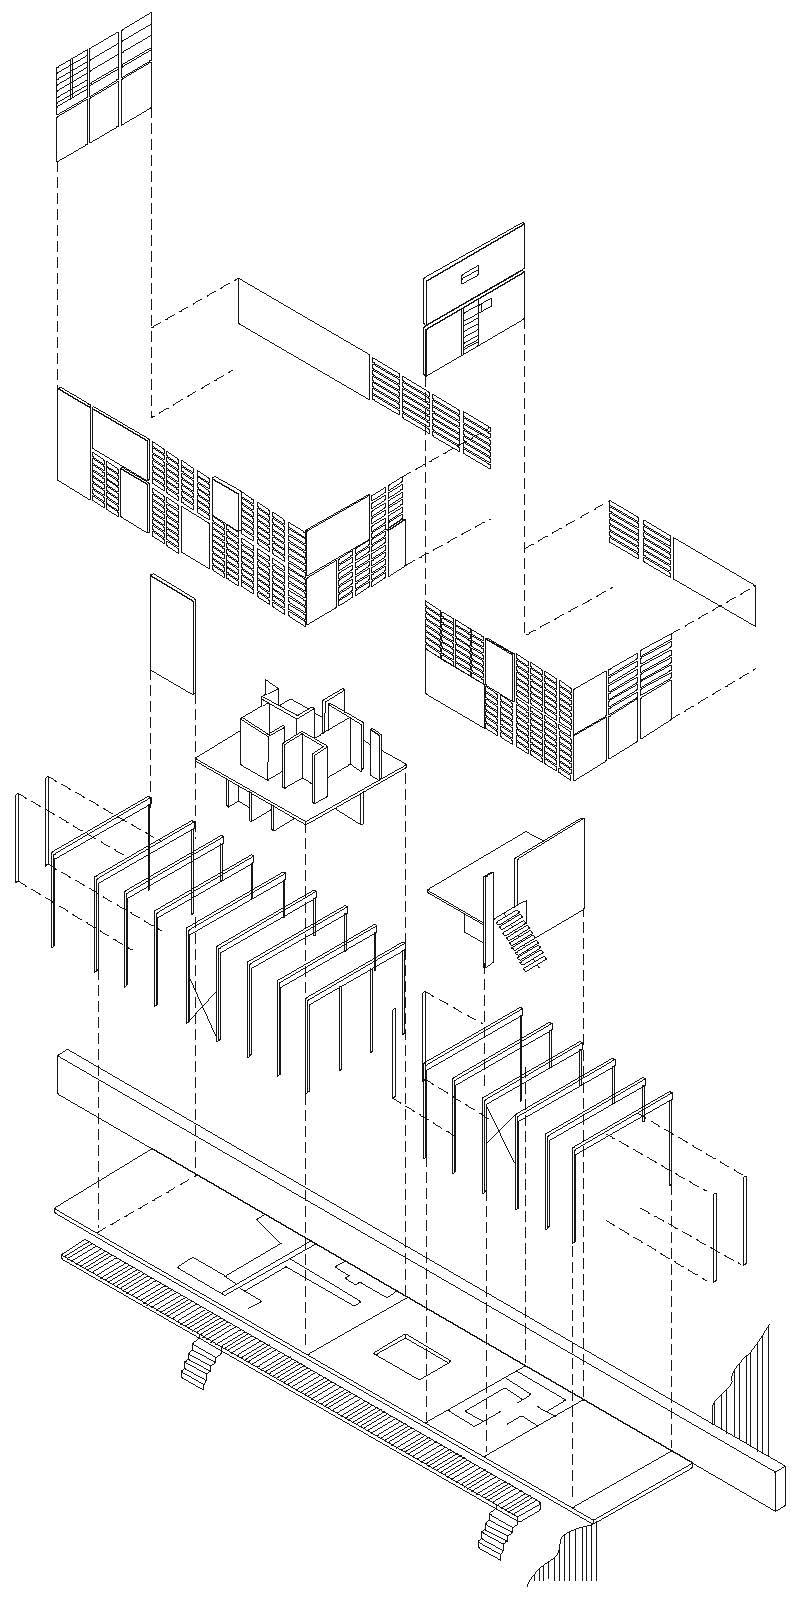 Eames House: Exploded Axonometric of Eames House